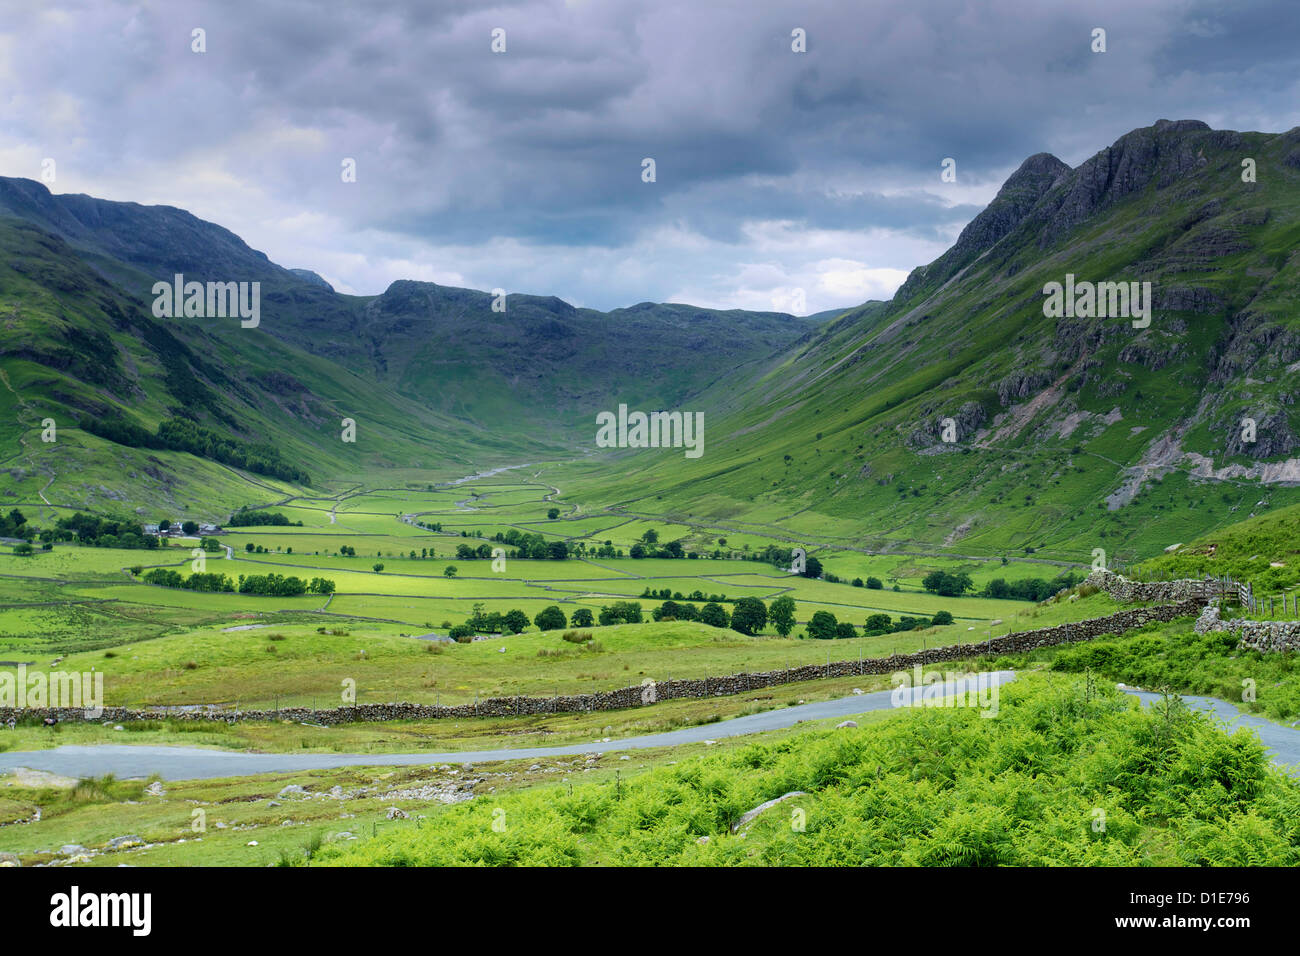 Langdale Pikes, Parc National de Lake District, Cumbria, Angleterre, Royaume-Uni, Europe Banque D'Images